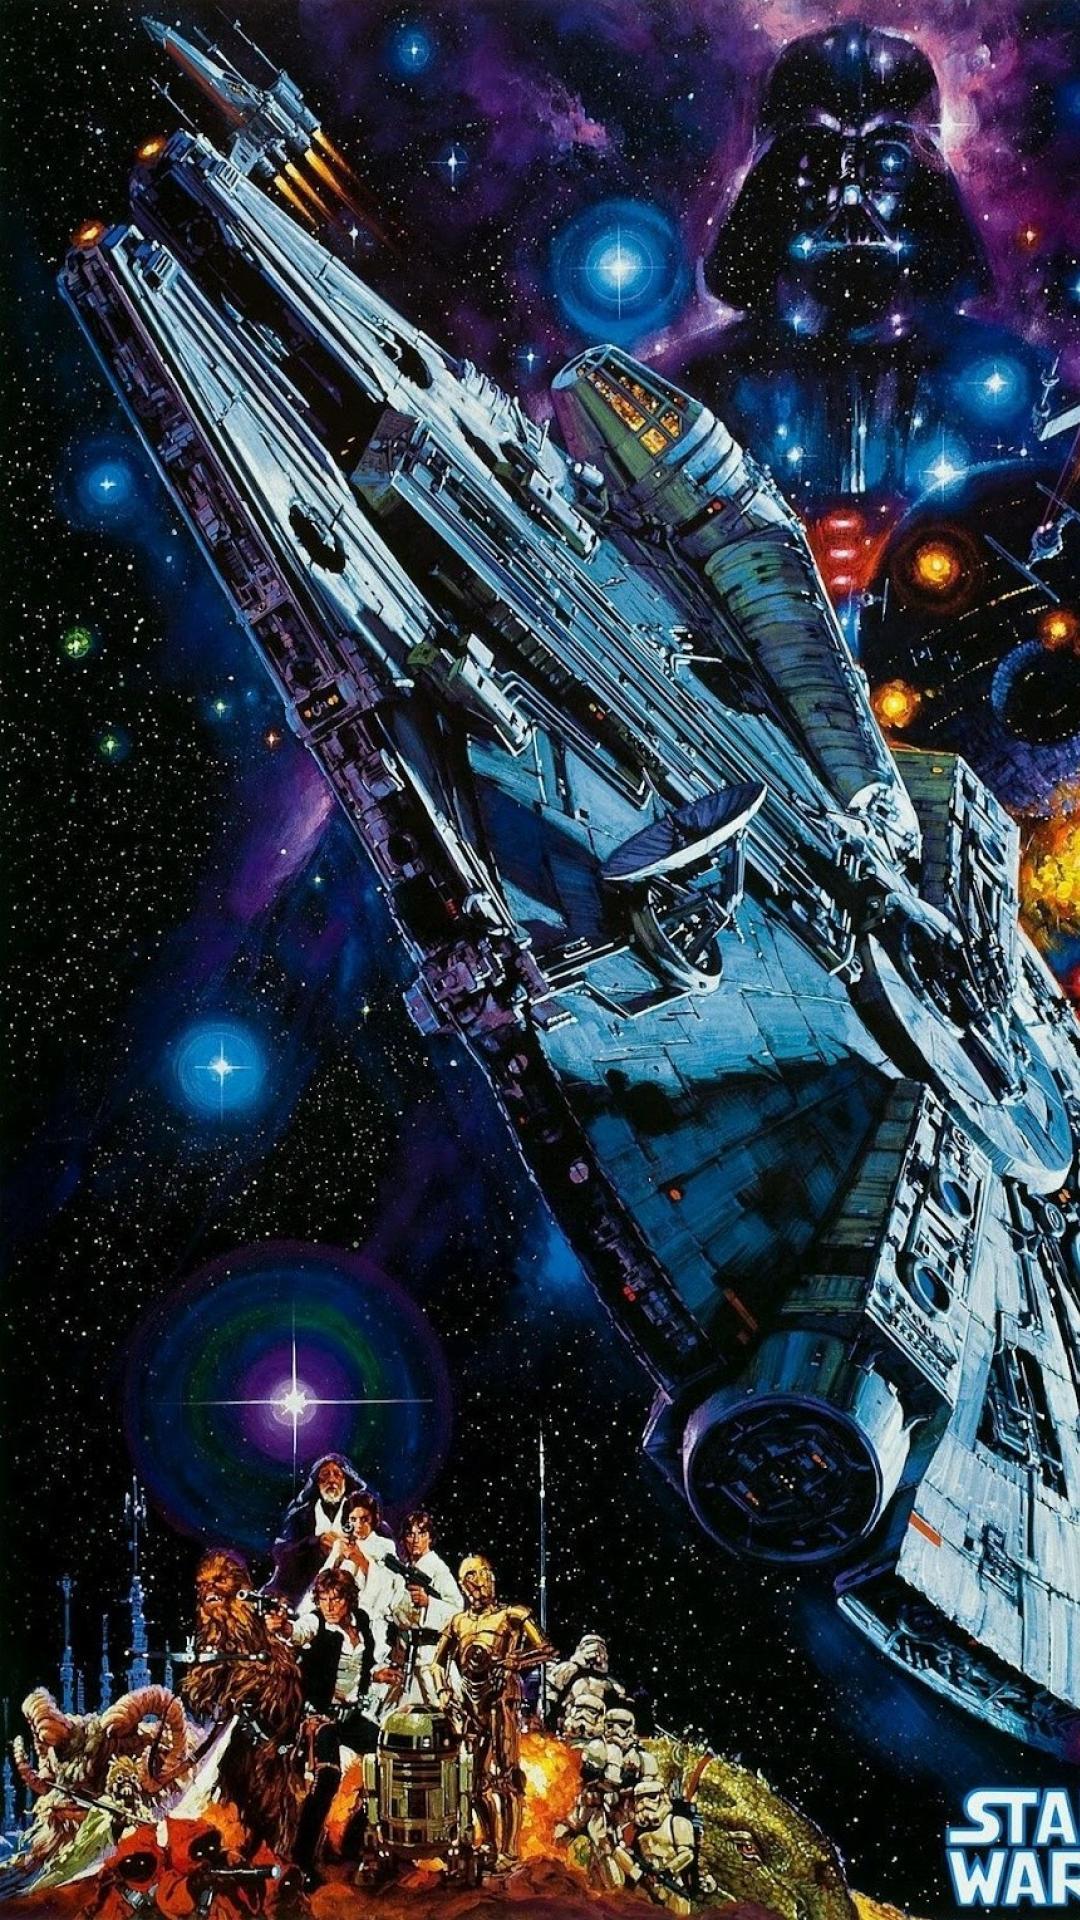 vader death star millennium falcon wars x wing wallpaper 80665 1080x1920